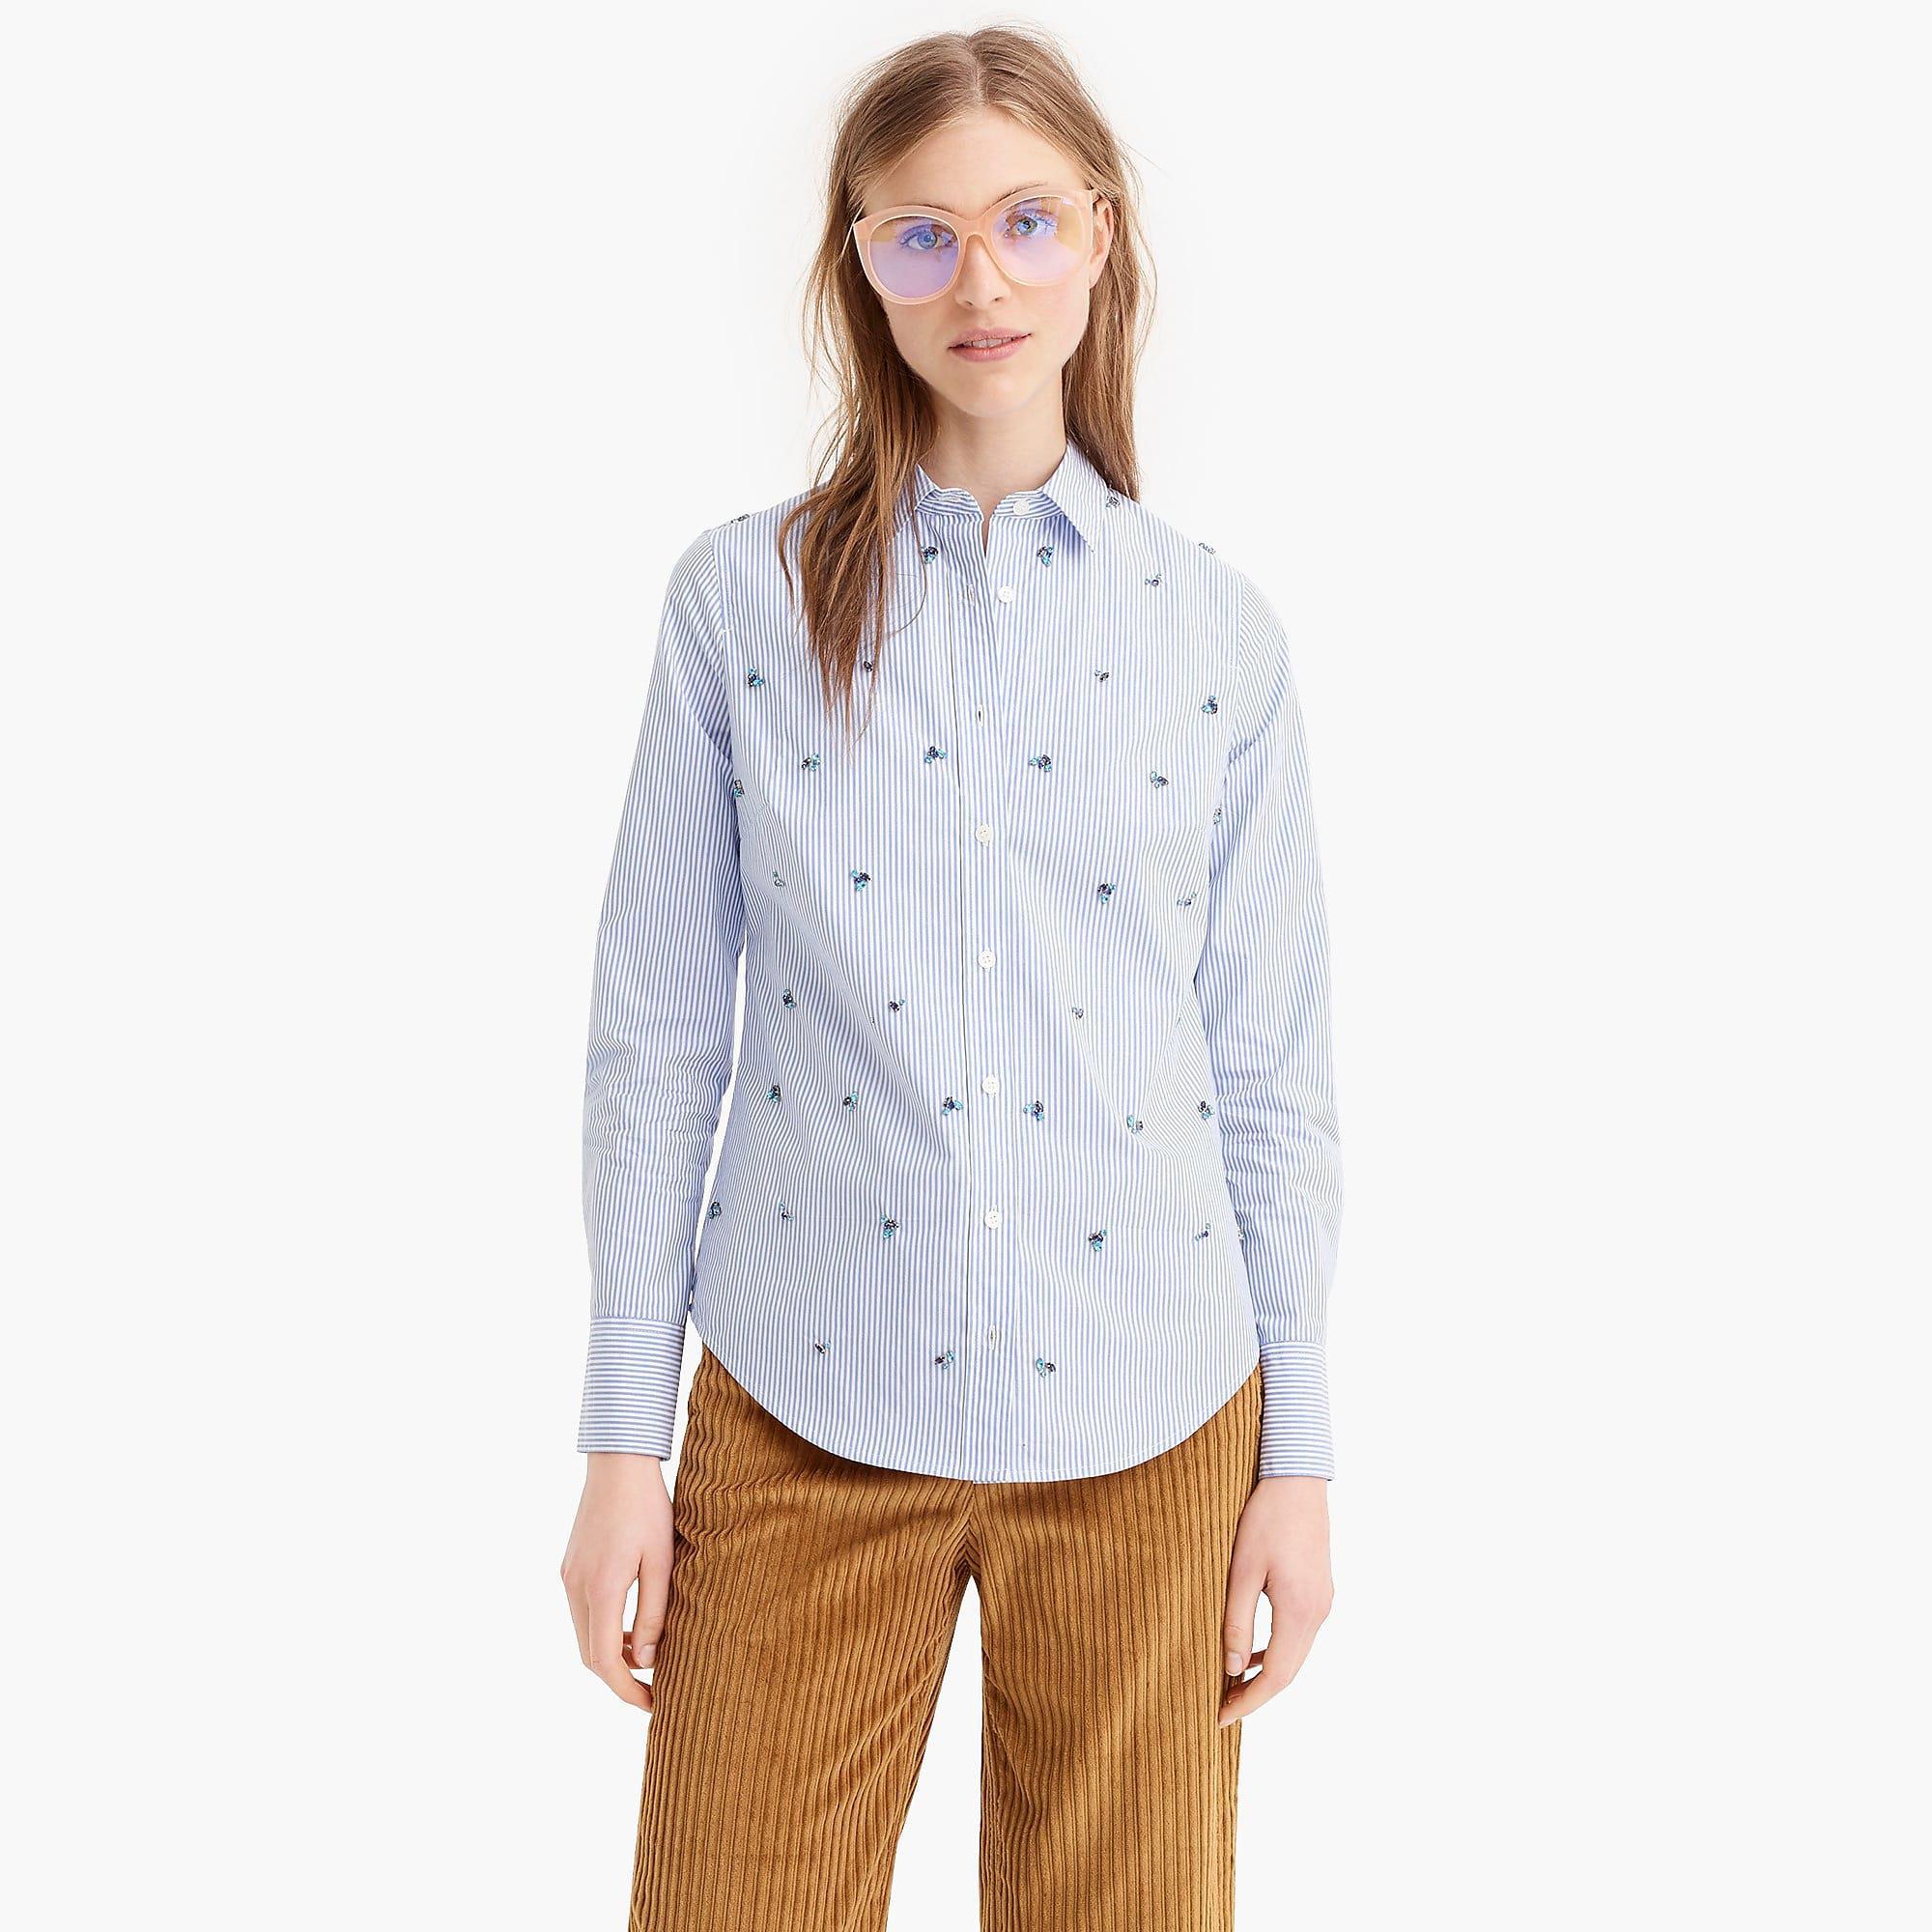 0a4bcd052eaf J.Crew Embellished Slim Stretch Perfect Shirt In Stripe in Blue - Lyst